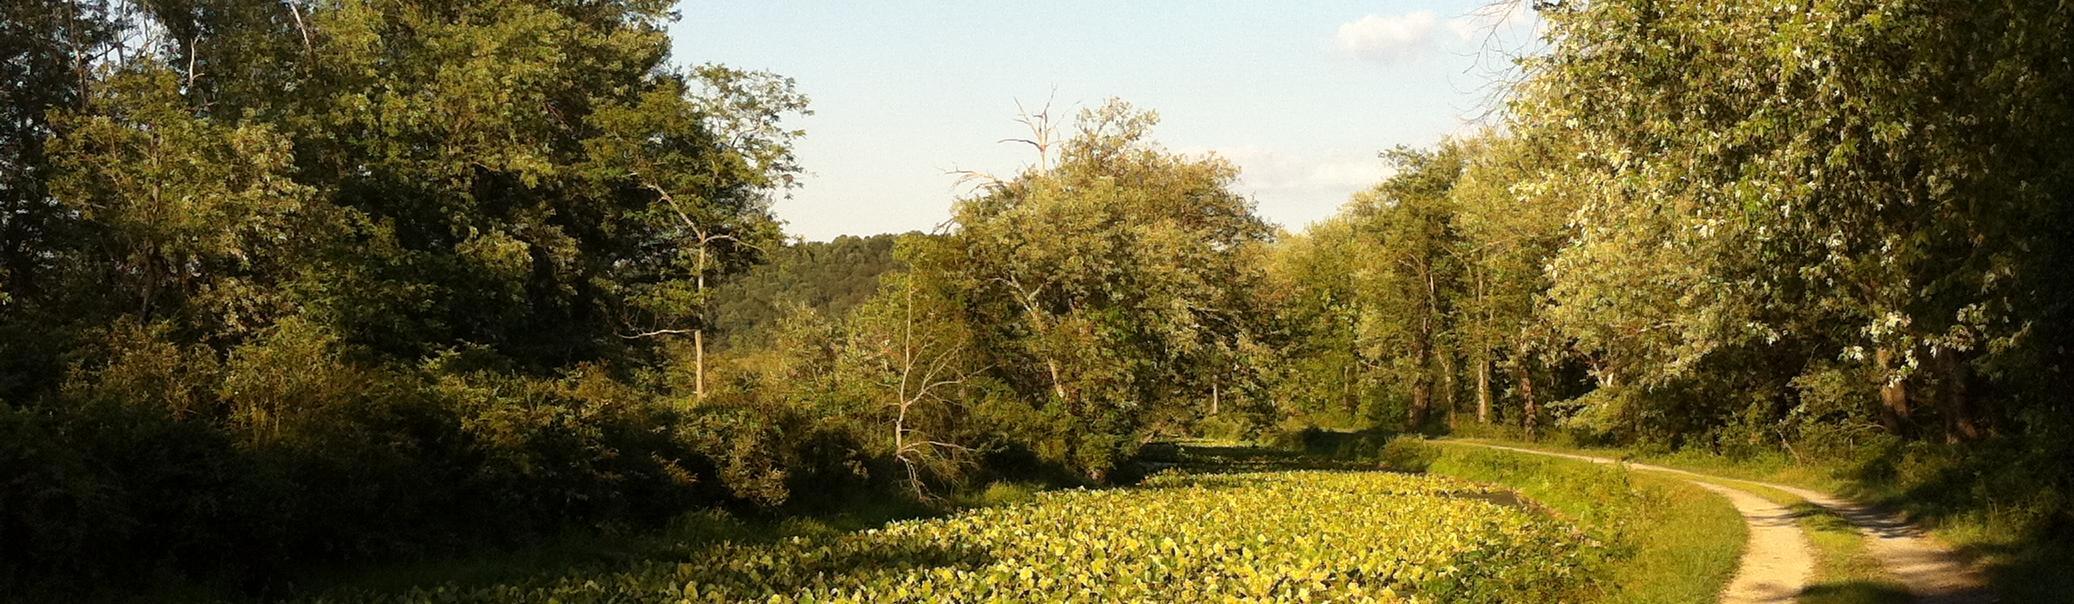 Chesapeake & Ohio Canal National Historical Park (U.S. National Park Service)